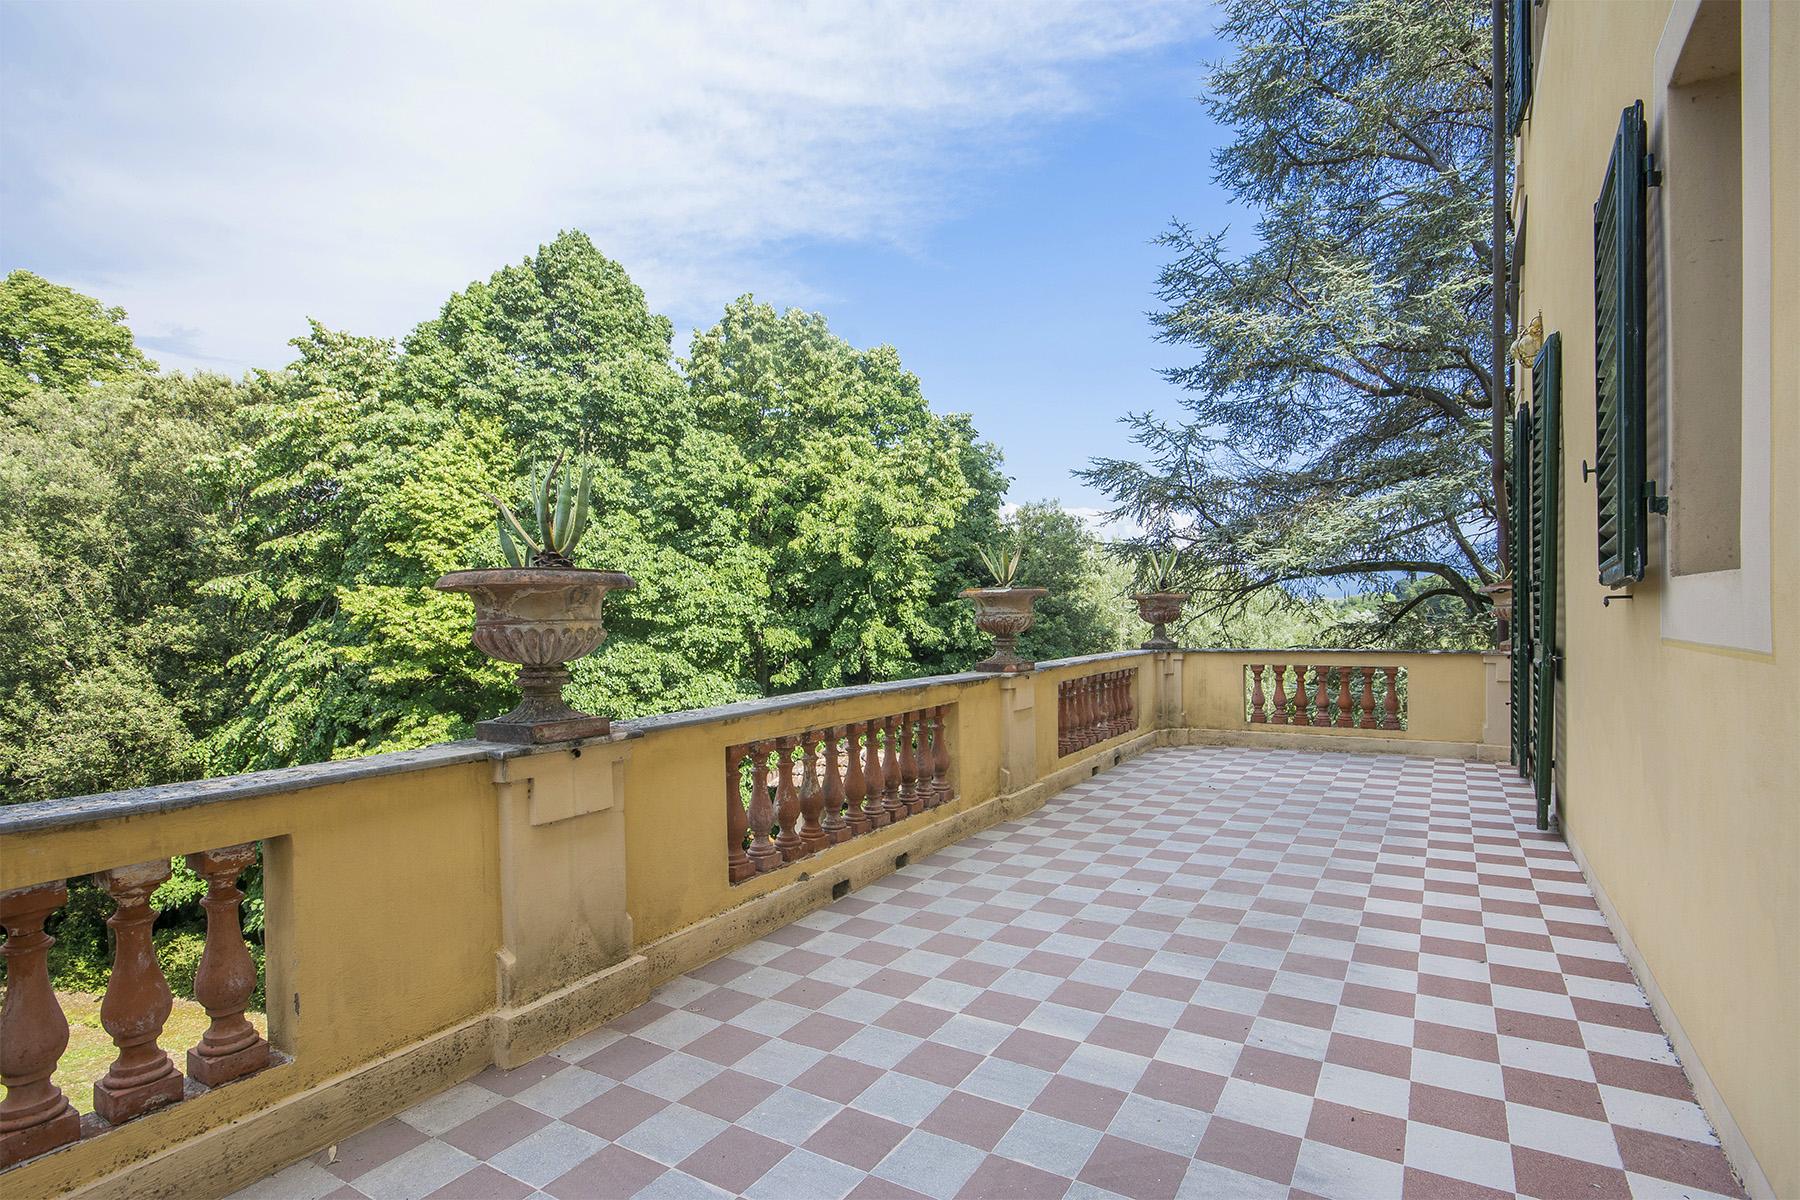 Villa in Vendita a Lucca: 5 locali, 1150 mq - Foto 22